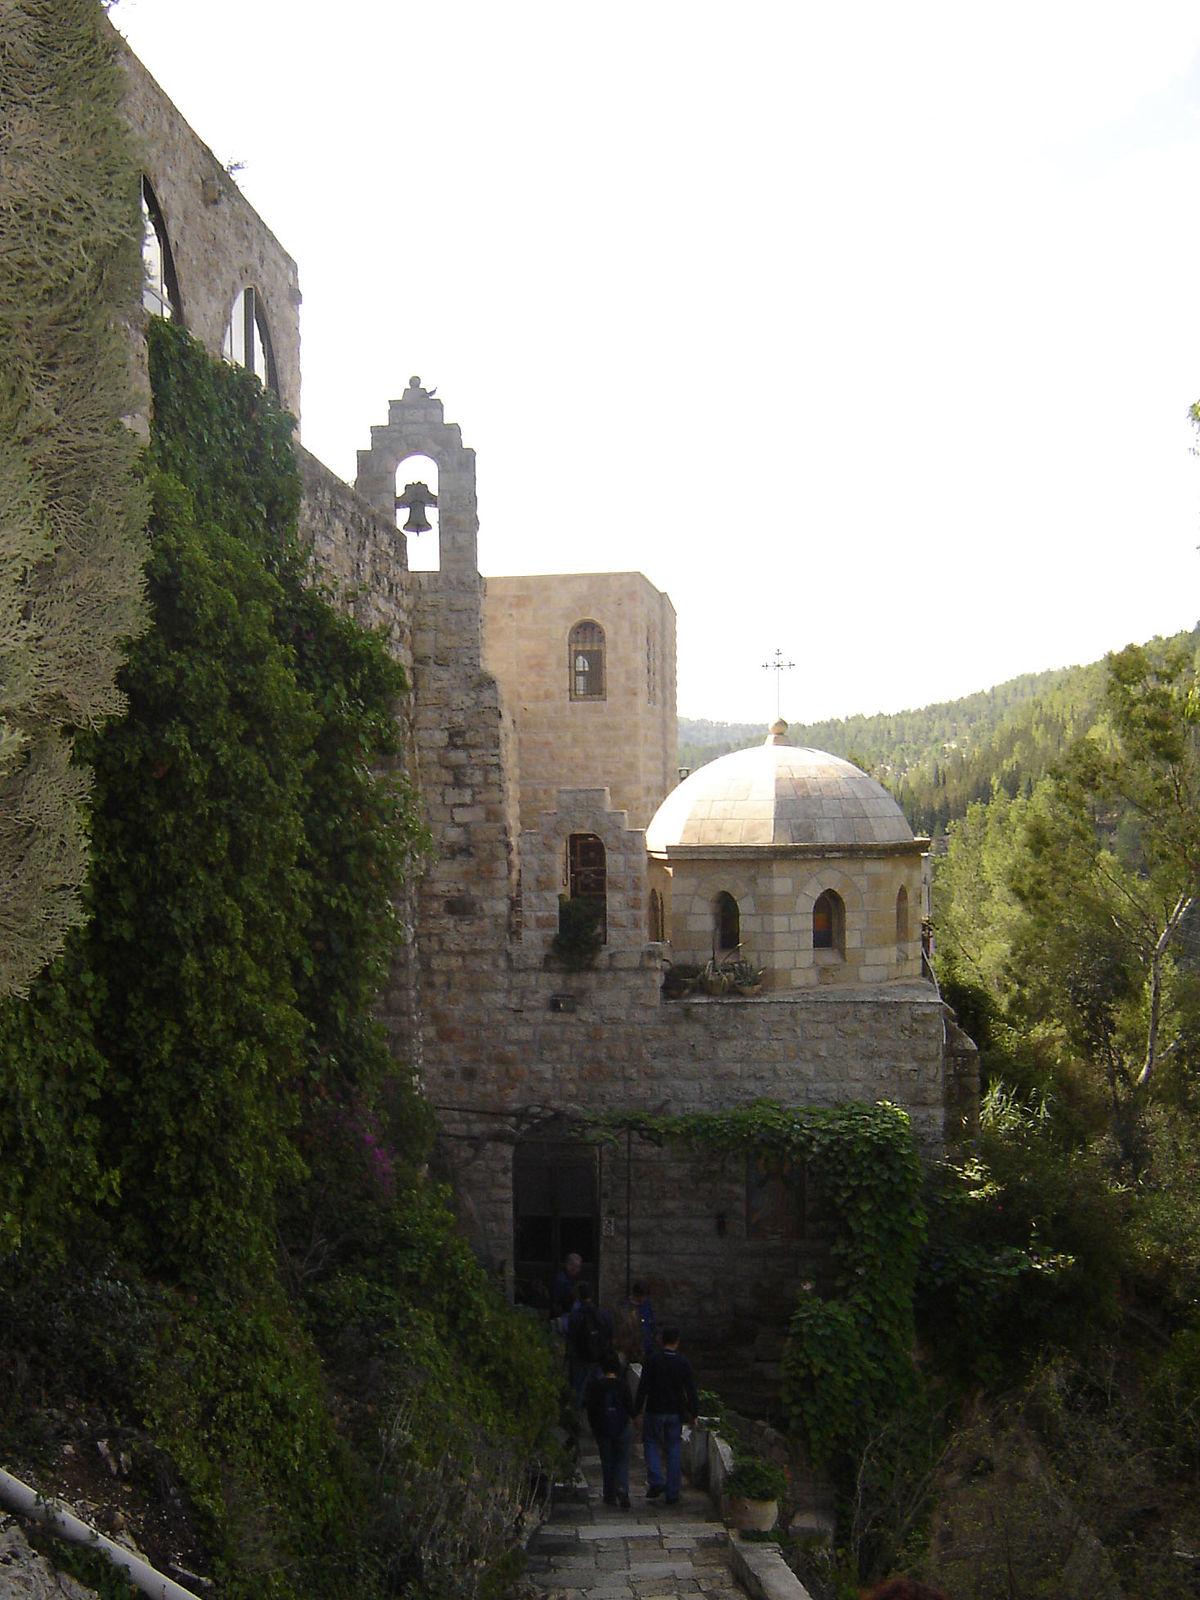 Monastery of Saint John in the Wilderness - Wikipedia